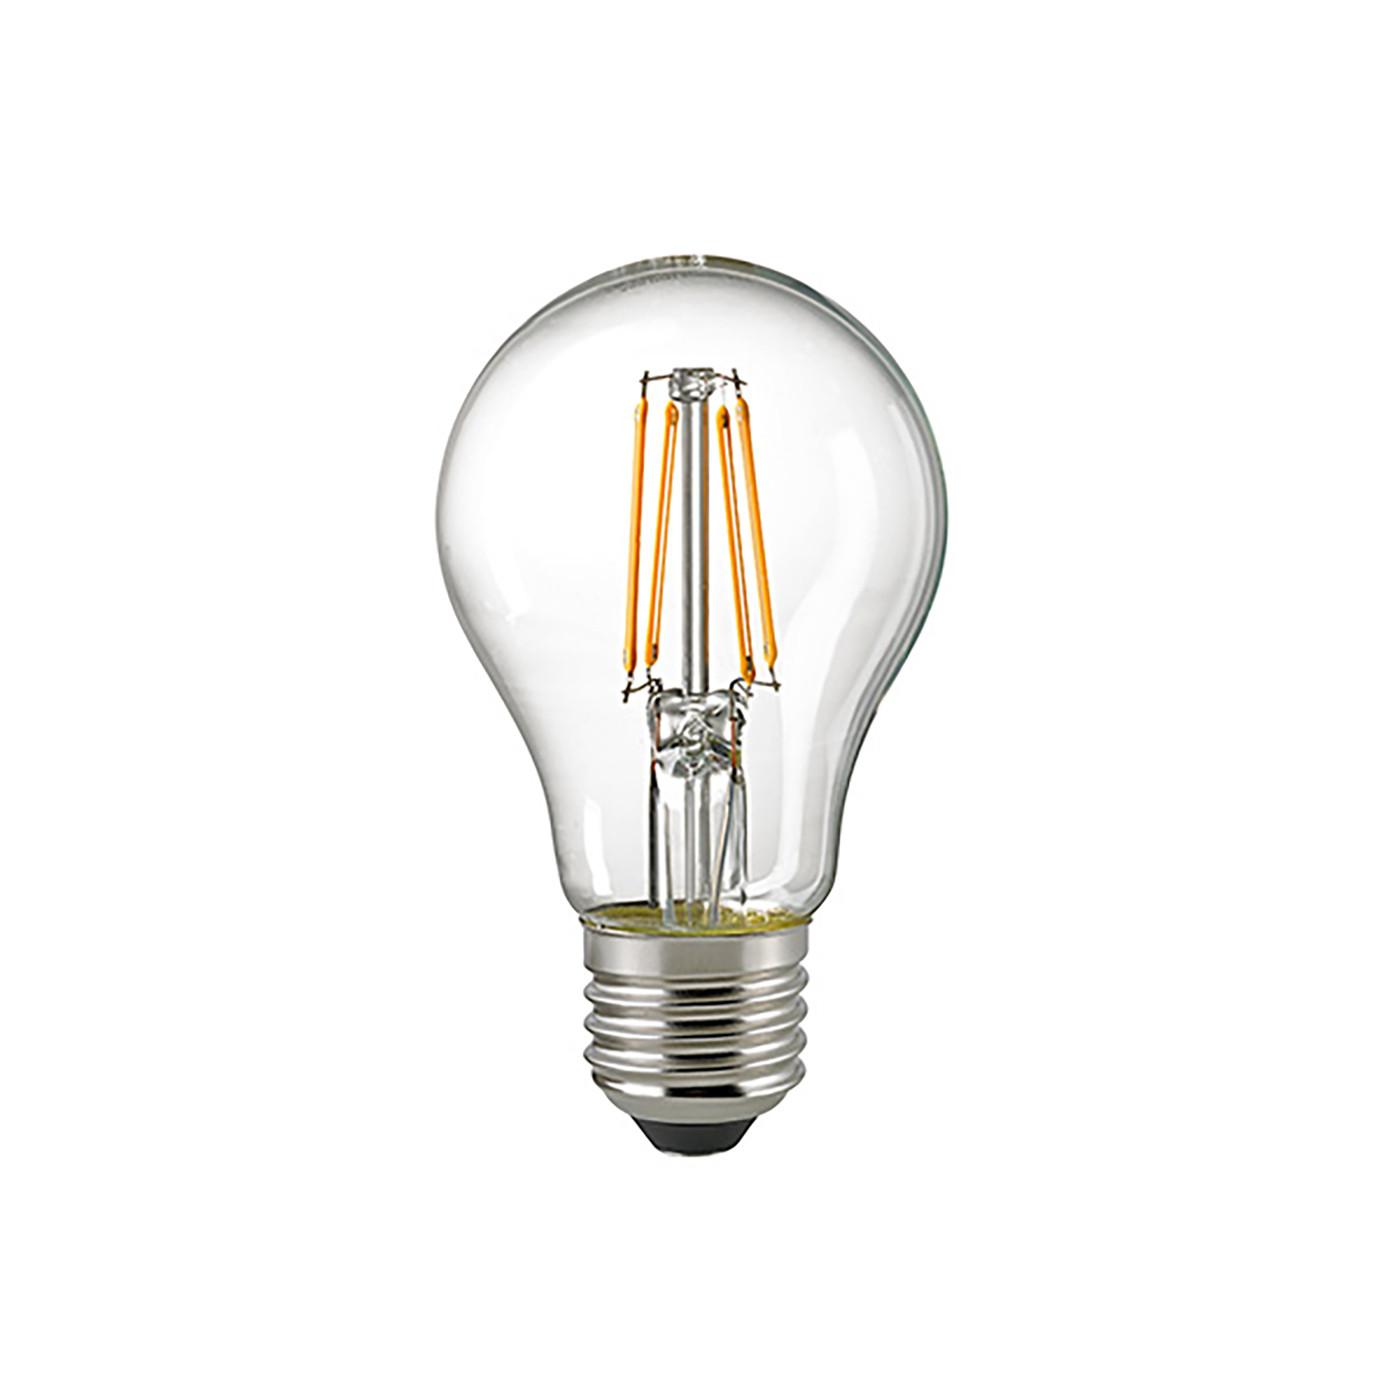 Sigor LED filament bulb shaped A60 2,5W 2700K 230V E27 clear